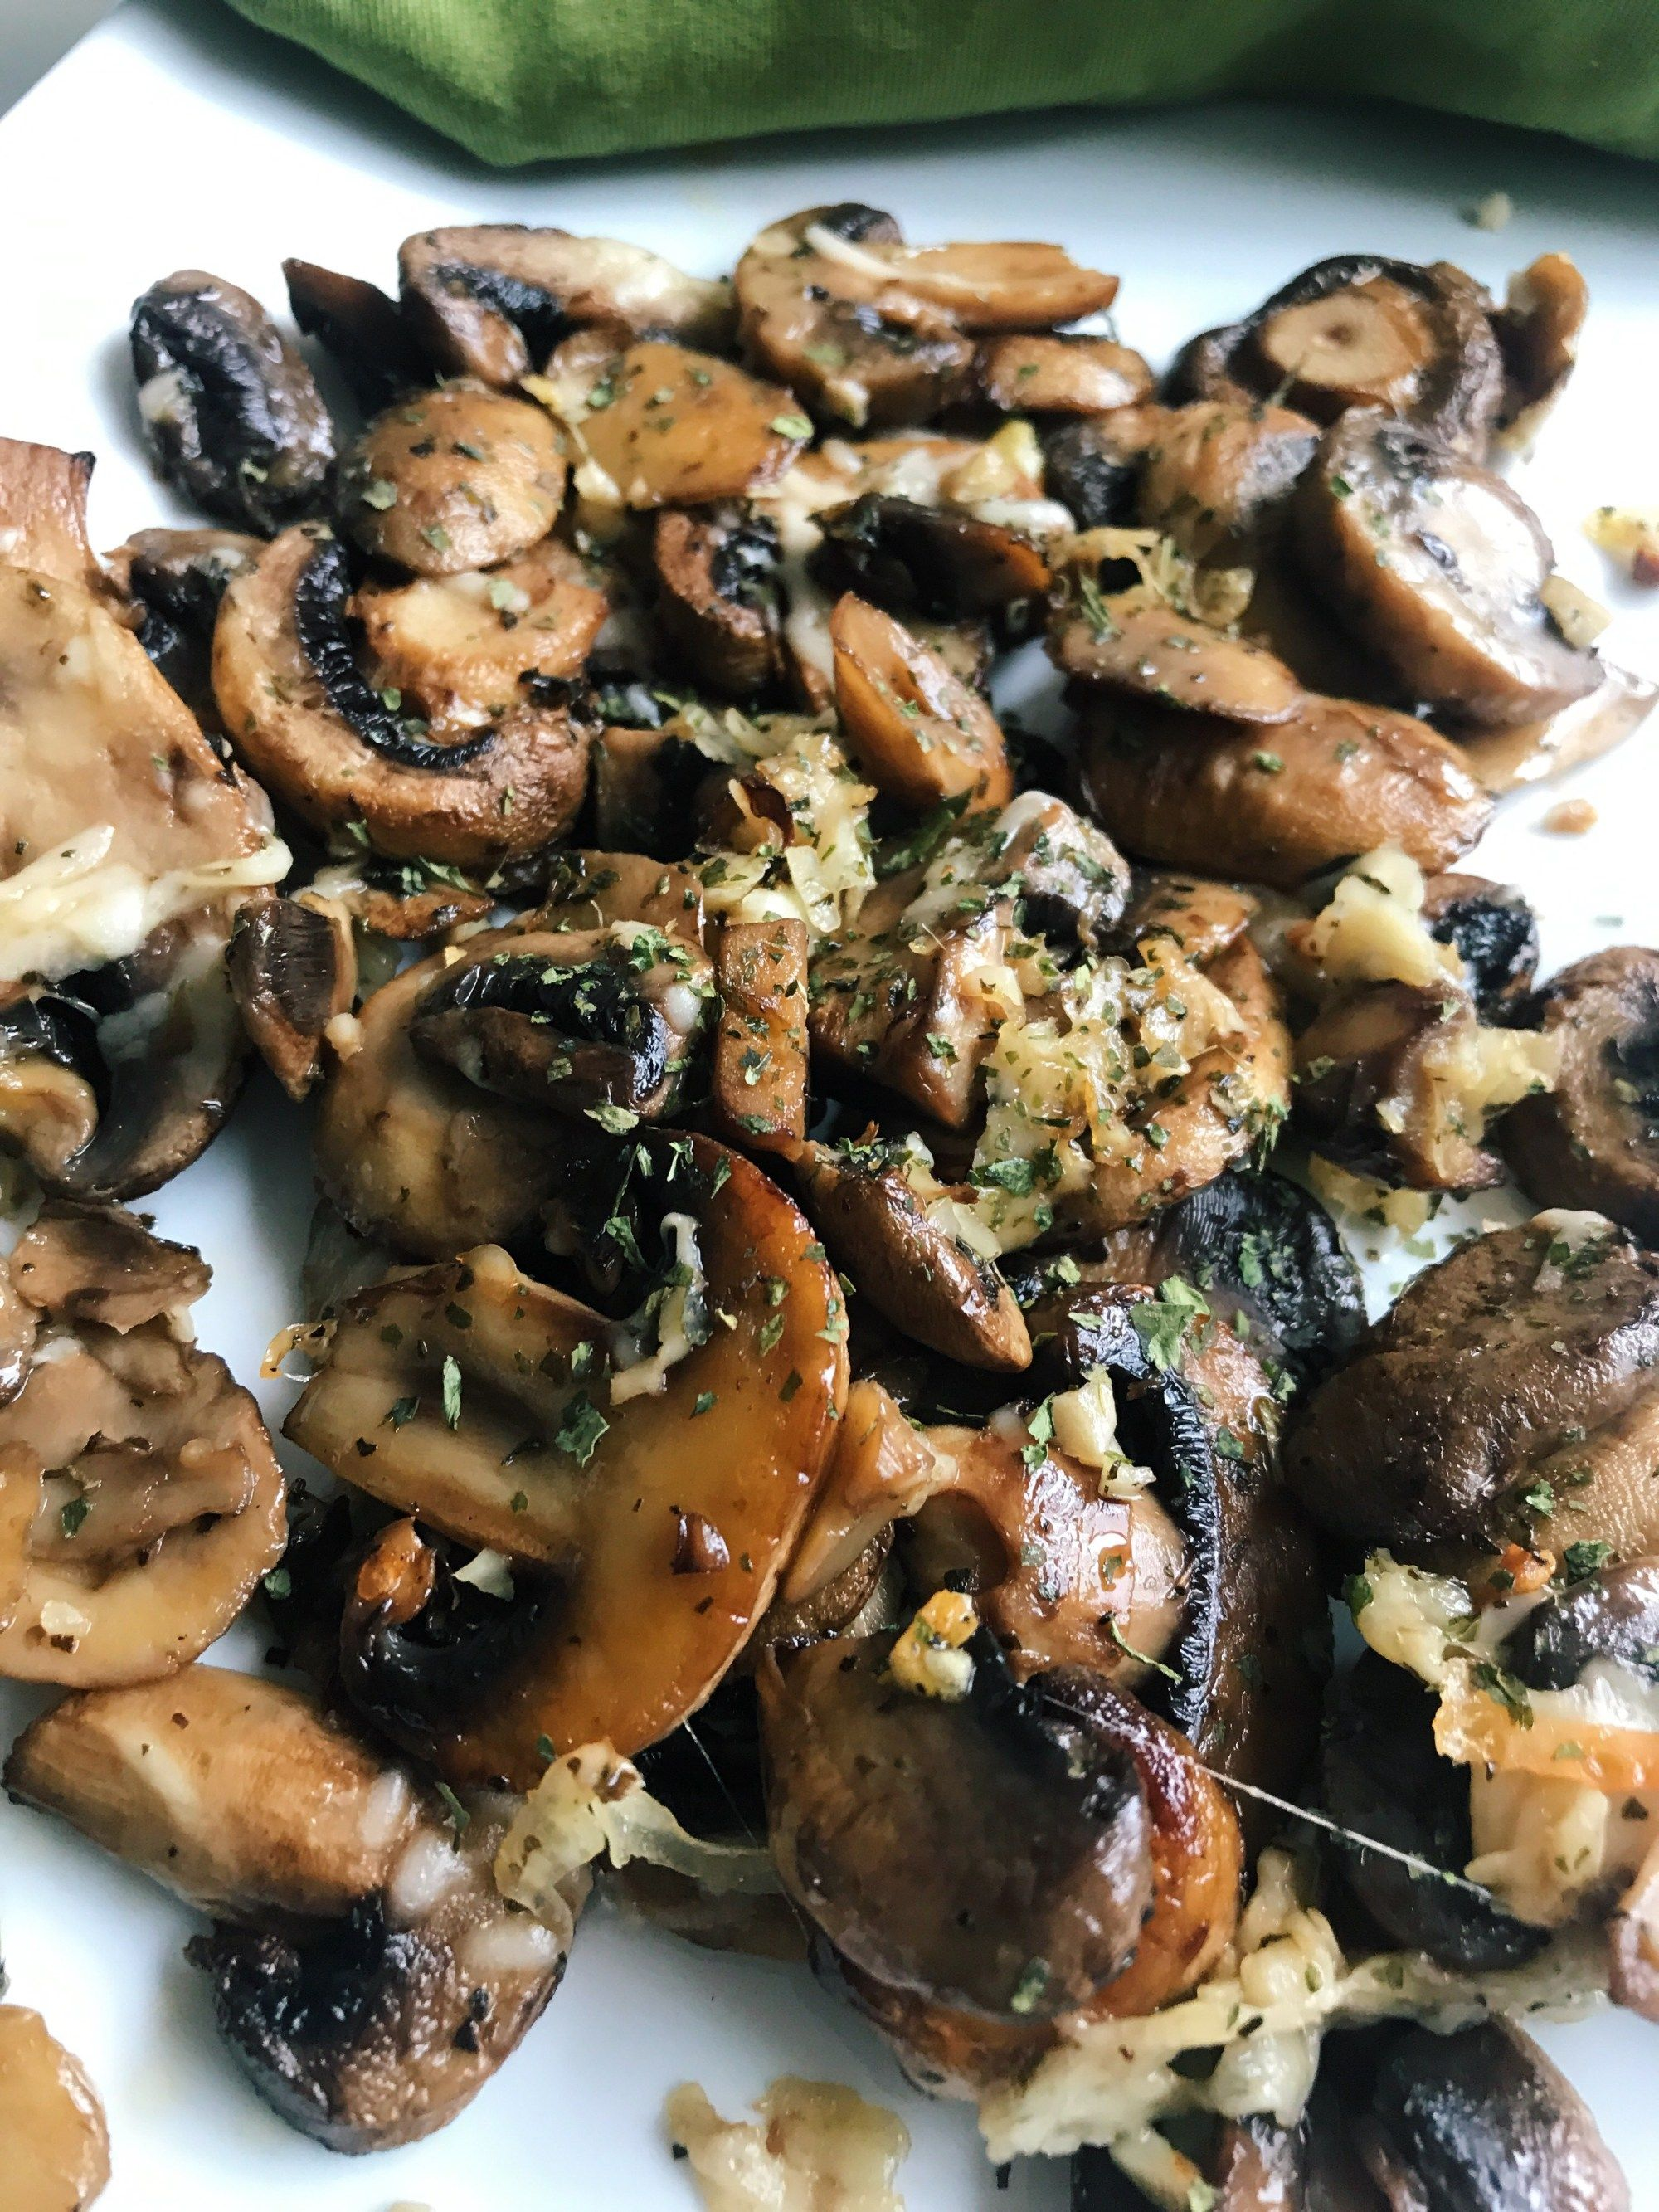 Parmesan Garlic Roasted Mushrooms - restoredreality